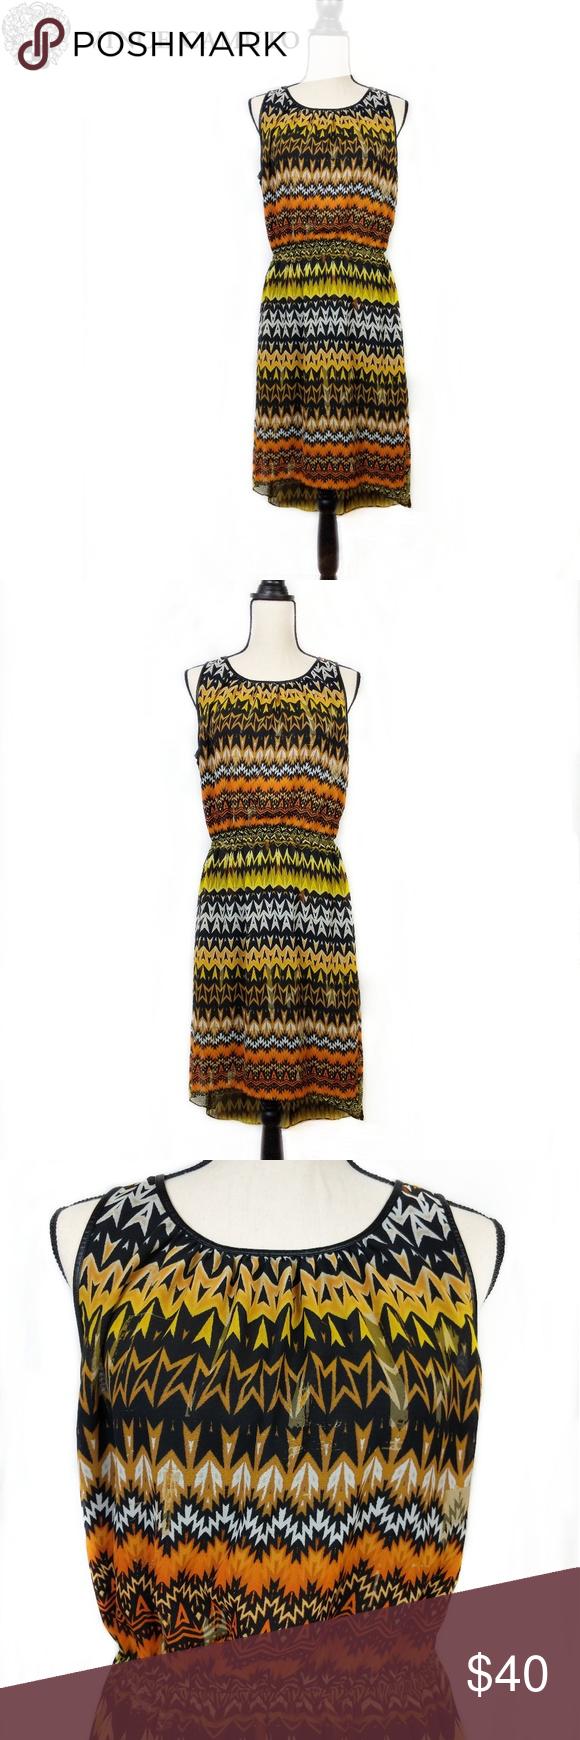 Vince Camuto Tribal Geometric Print Hi Low Dress M Vince Camuto Size M Scoop Neck Dress Sleeveless Geometri Hi Low Dresses Tribal Geometric Scoop Neck Dress [ 1740 x 580 Pixel ]